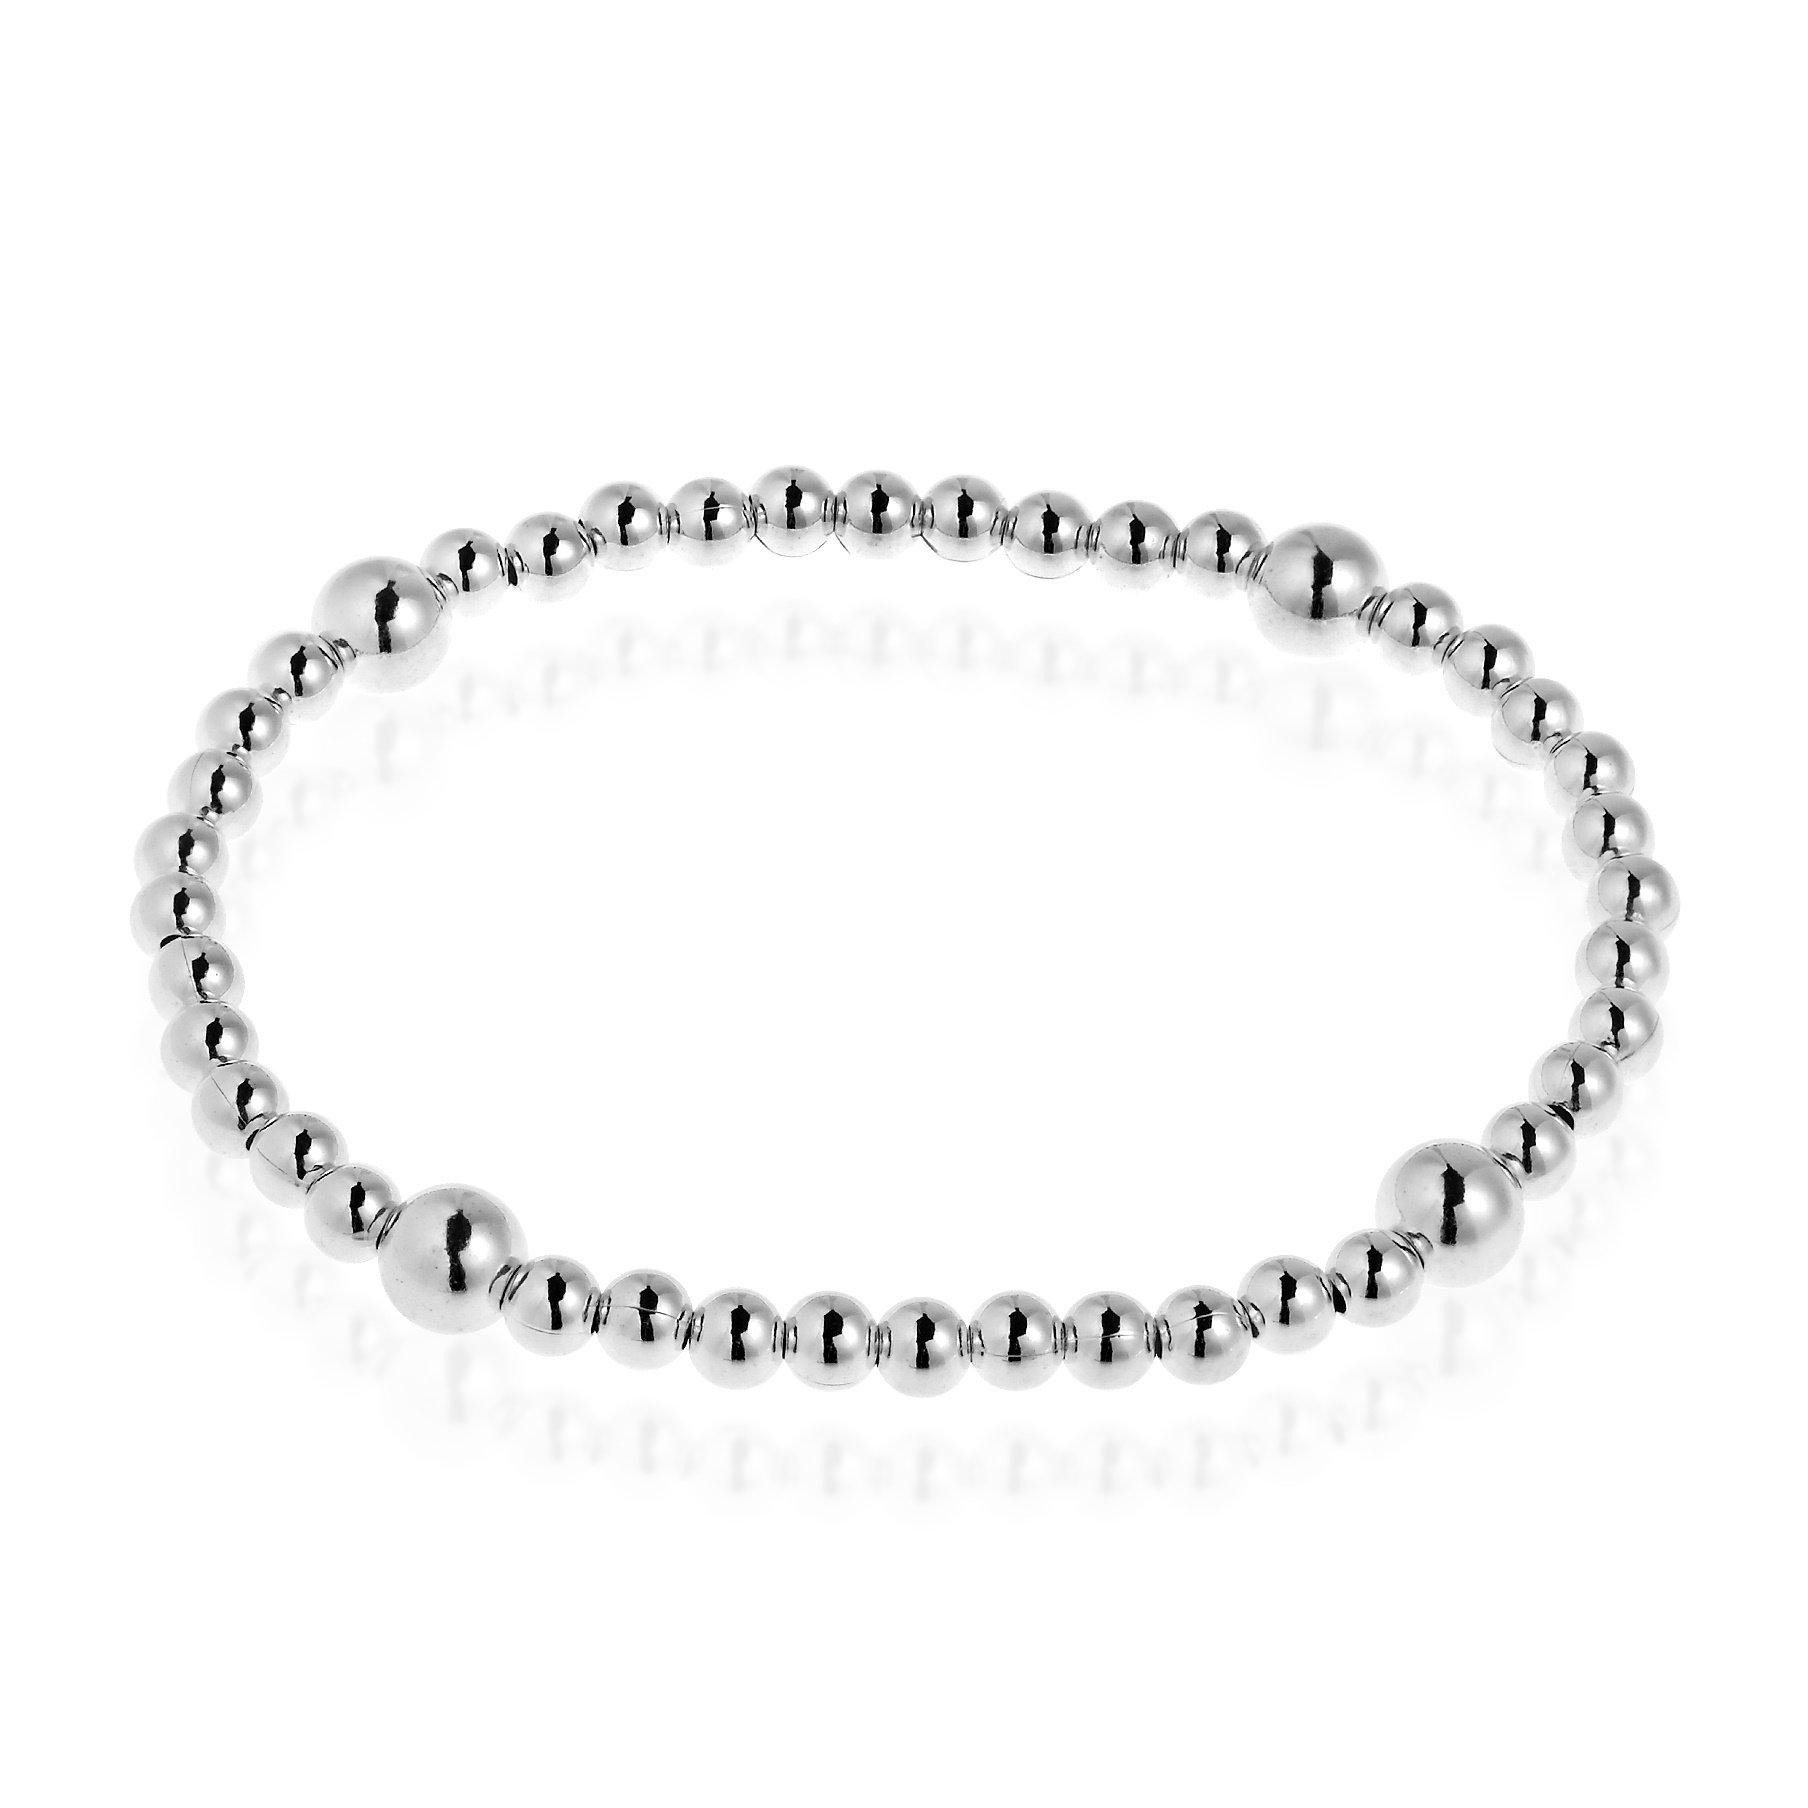 AeraVida Sleek Elastic Sterling Silver Beads Stretch Bracelet